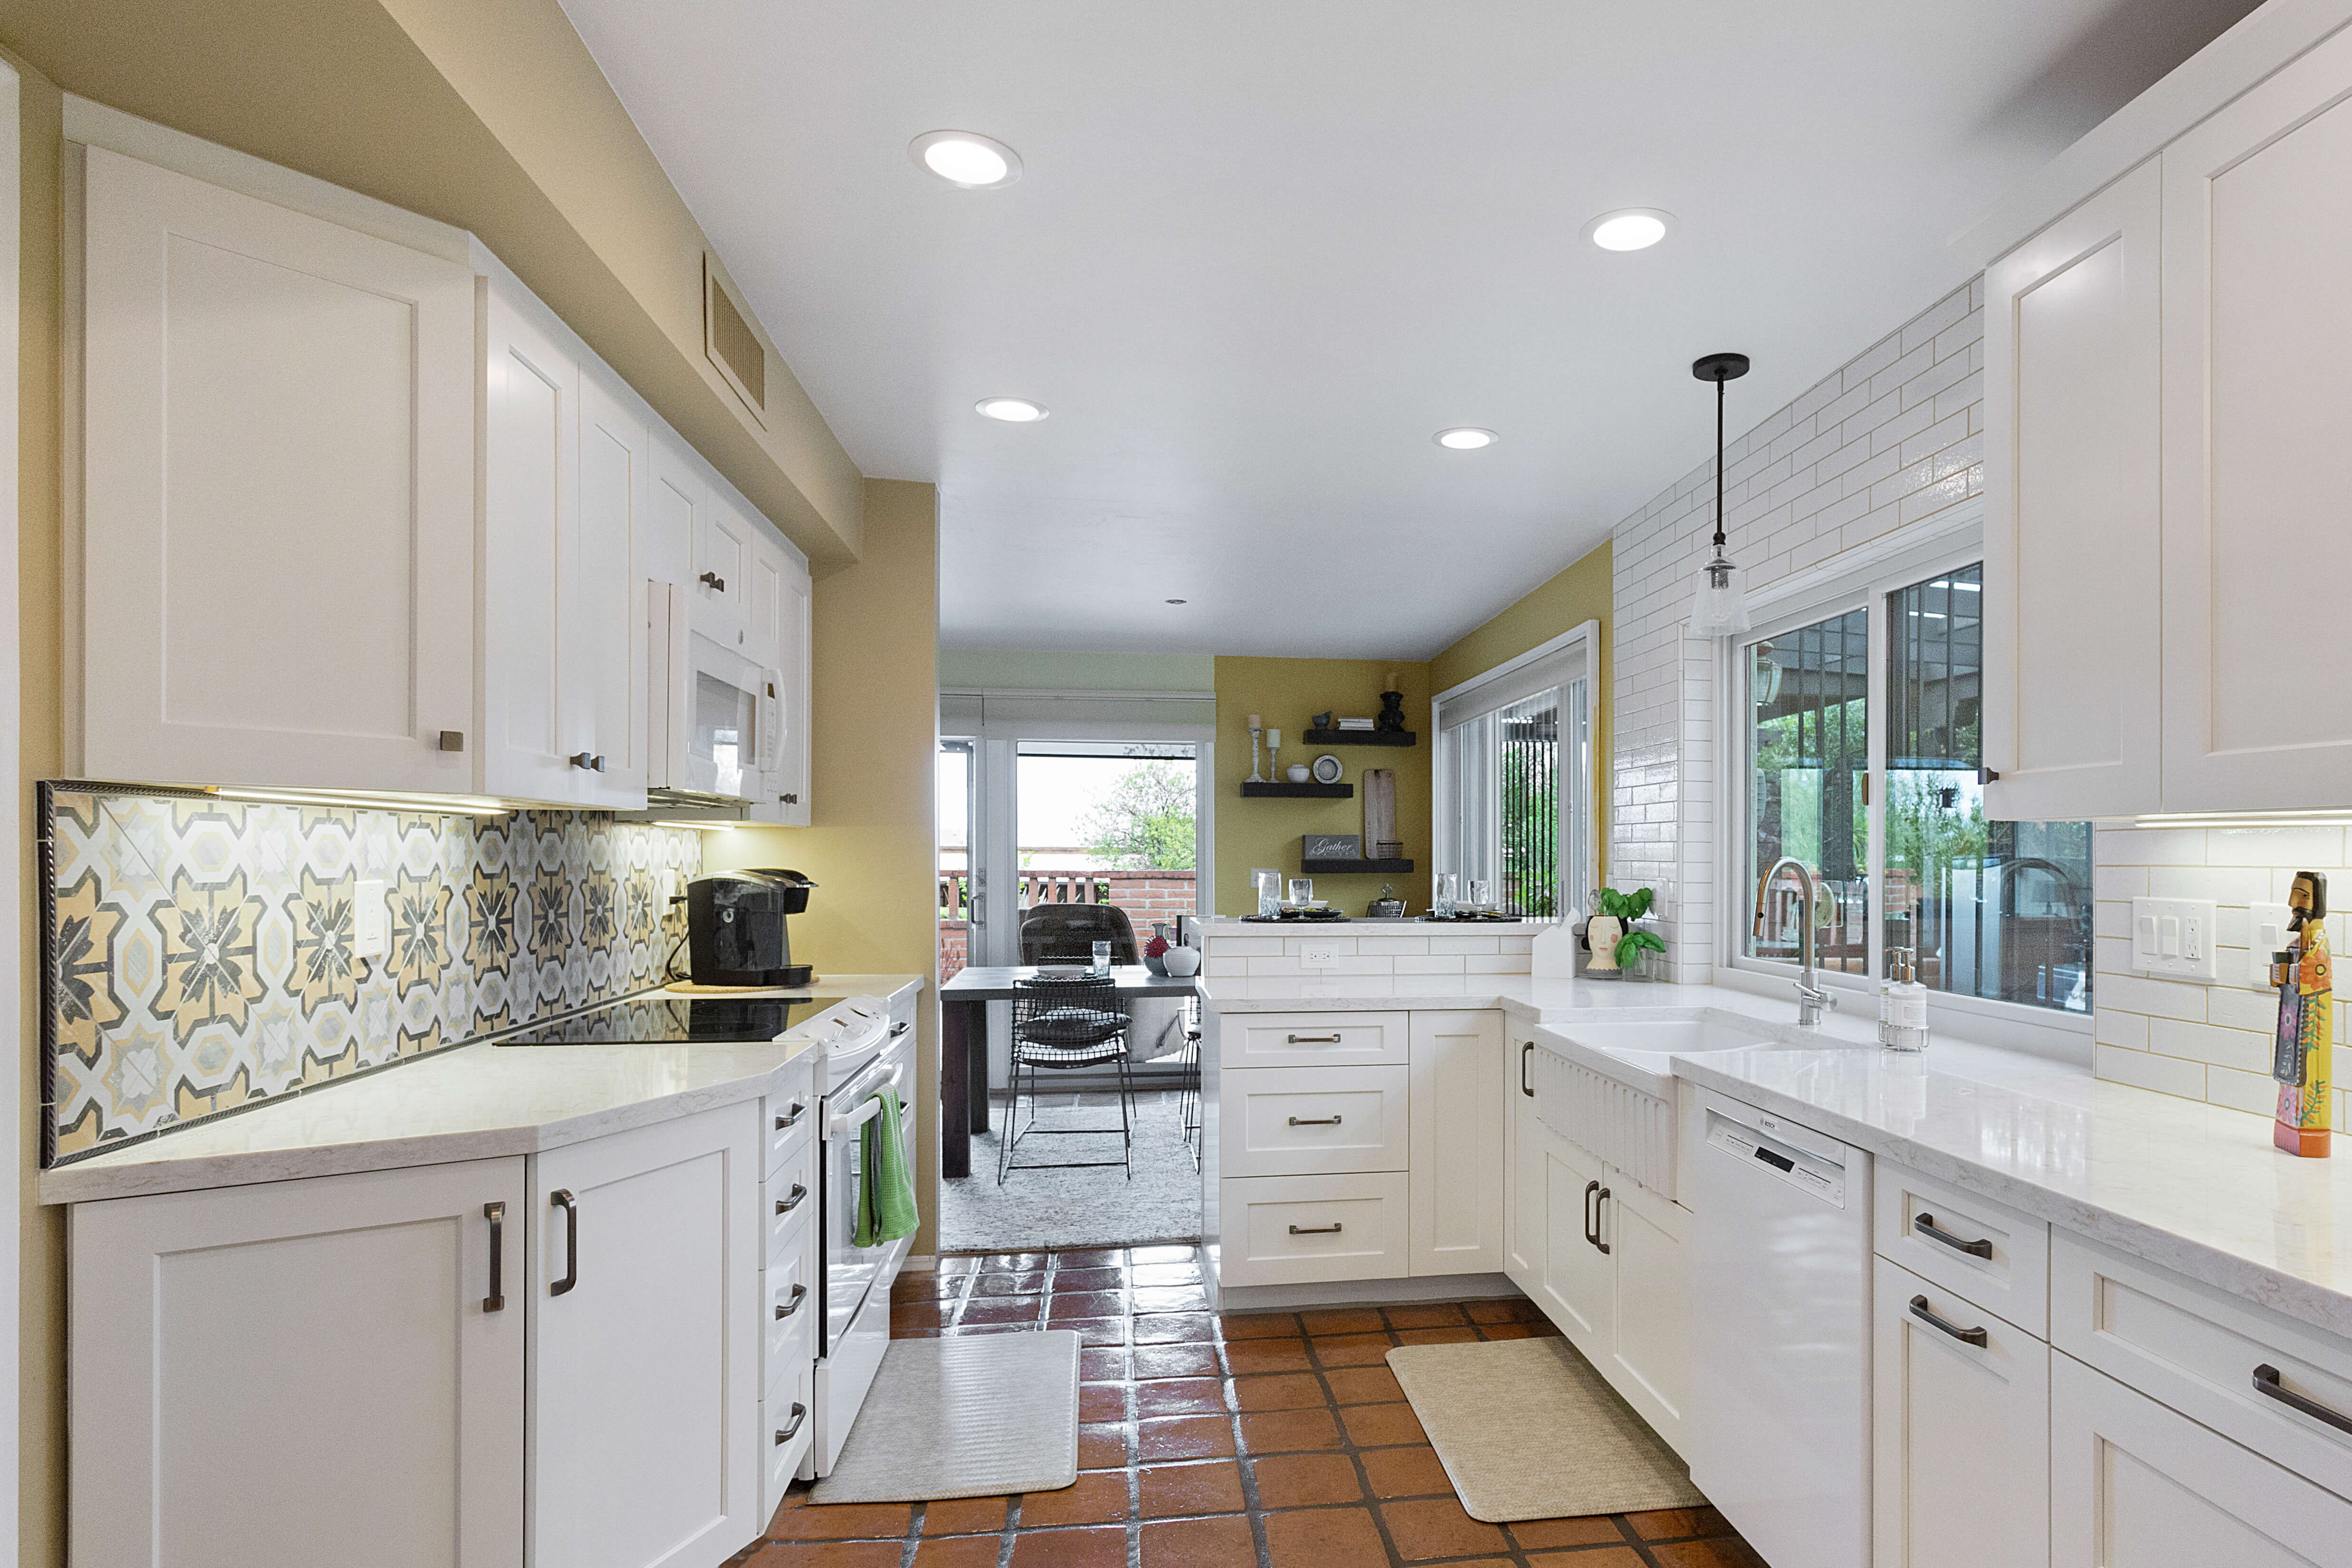 tucson real estate photographykc creative design-3